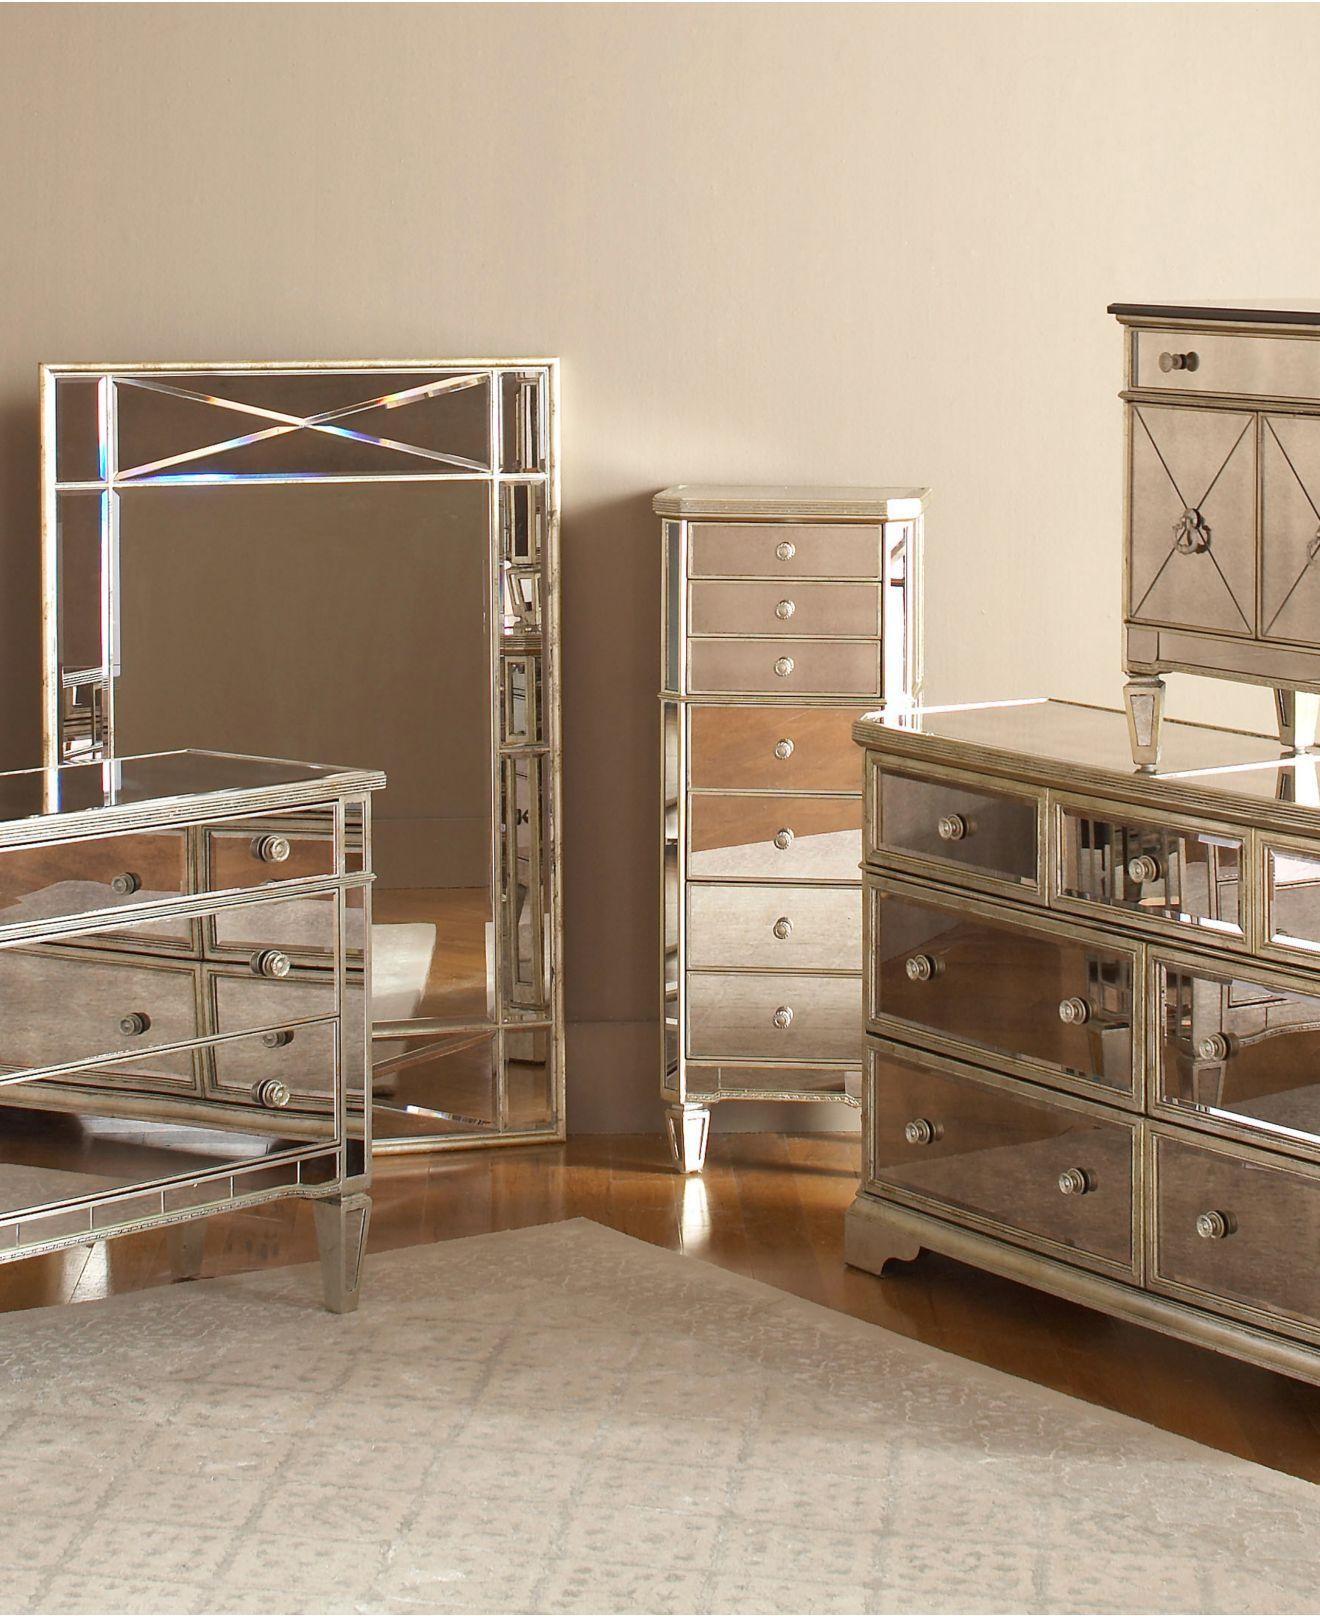 Marais Mirrored Furniture Collection | Pinterest ...